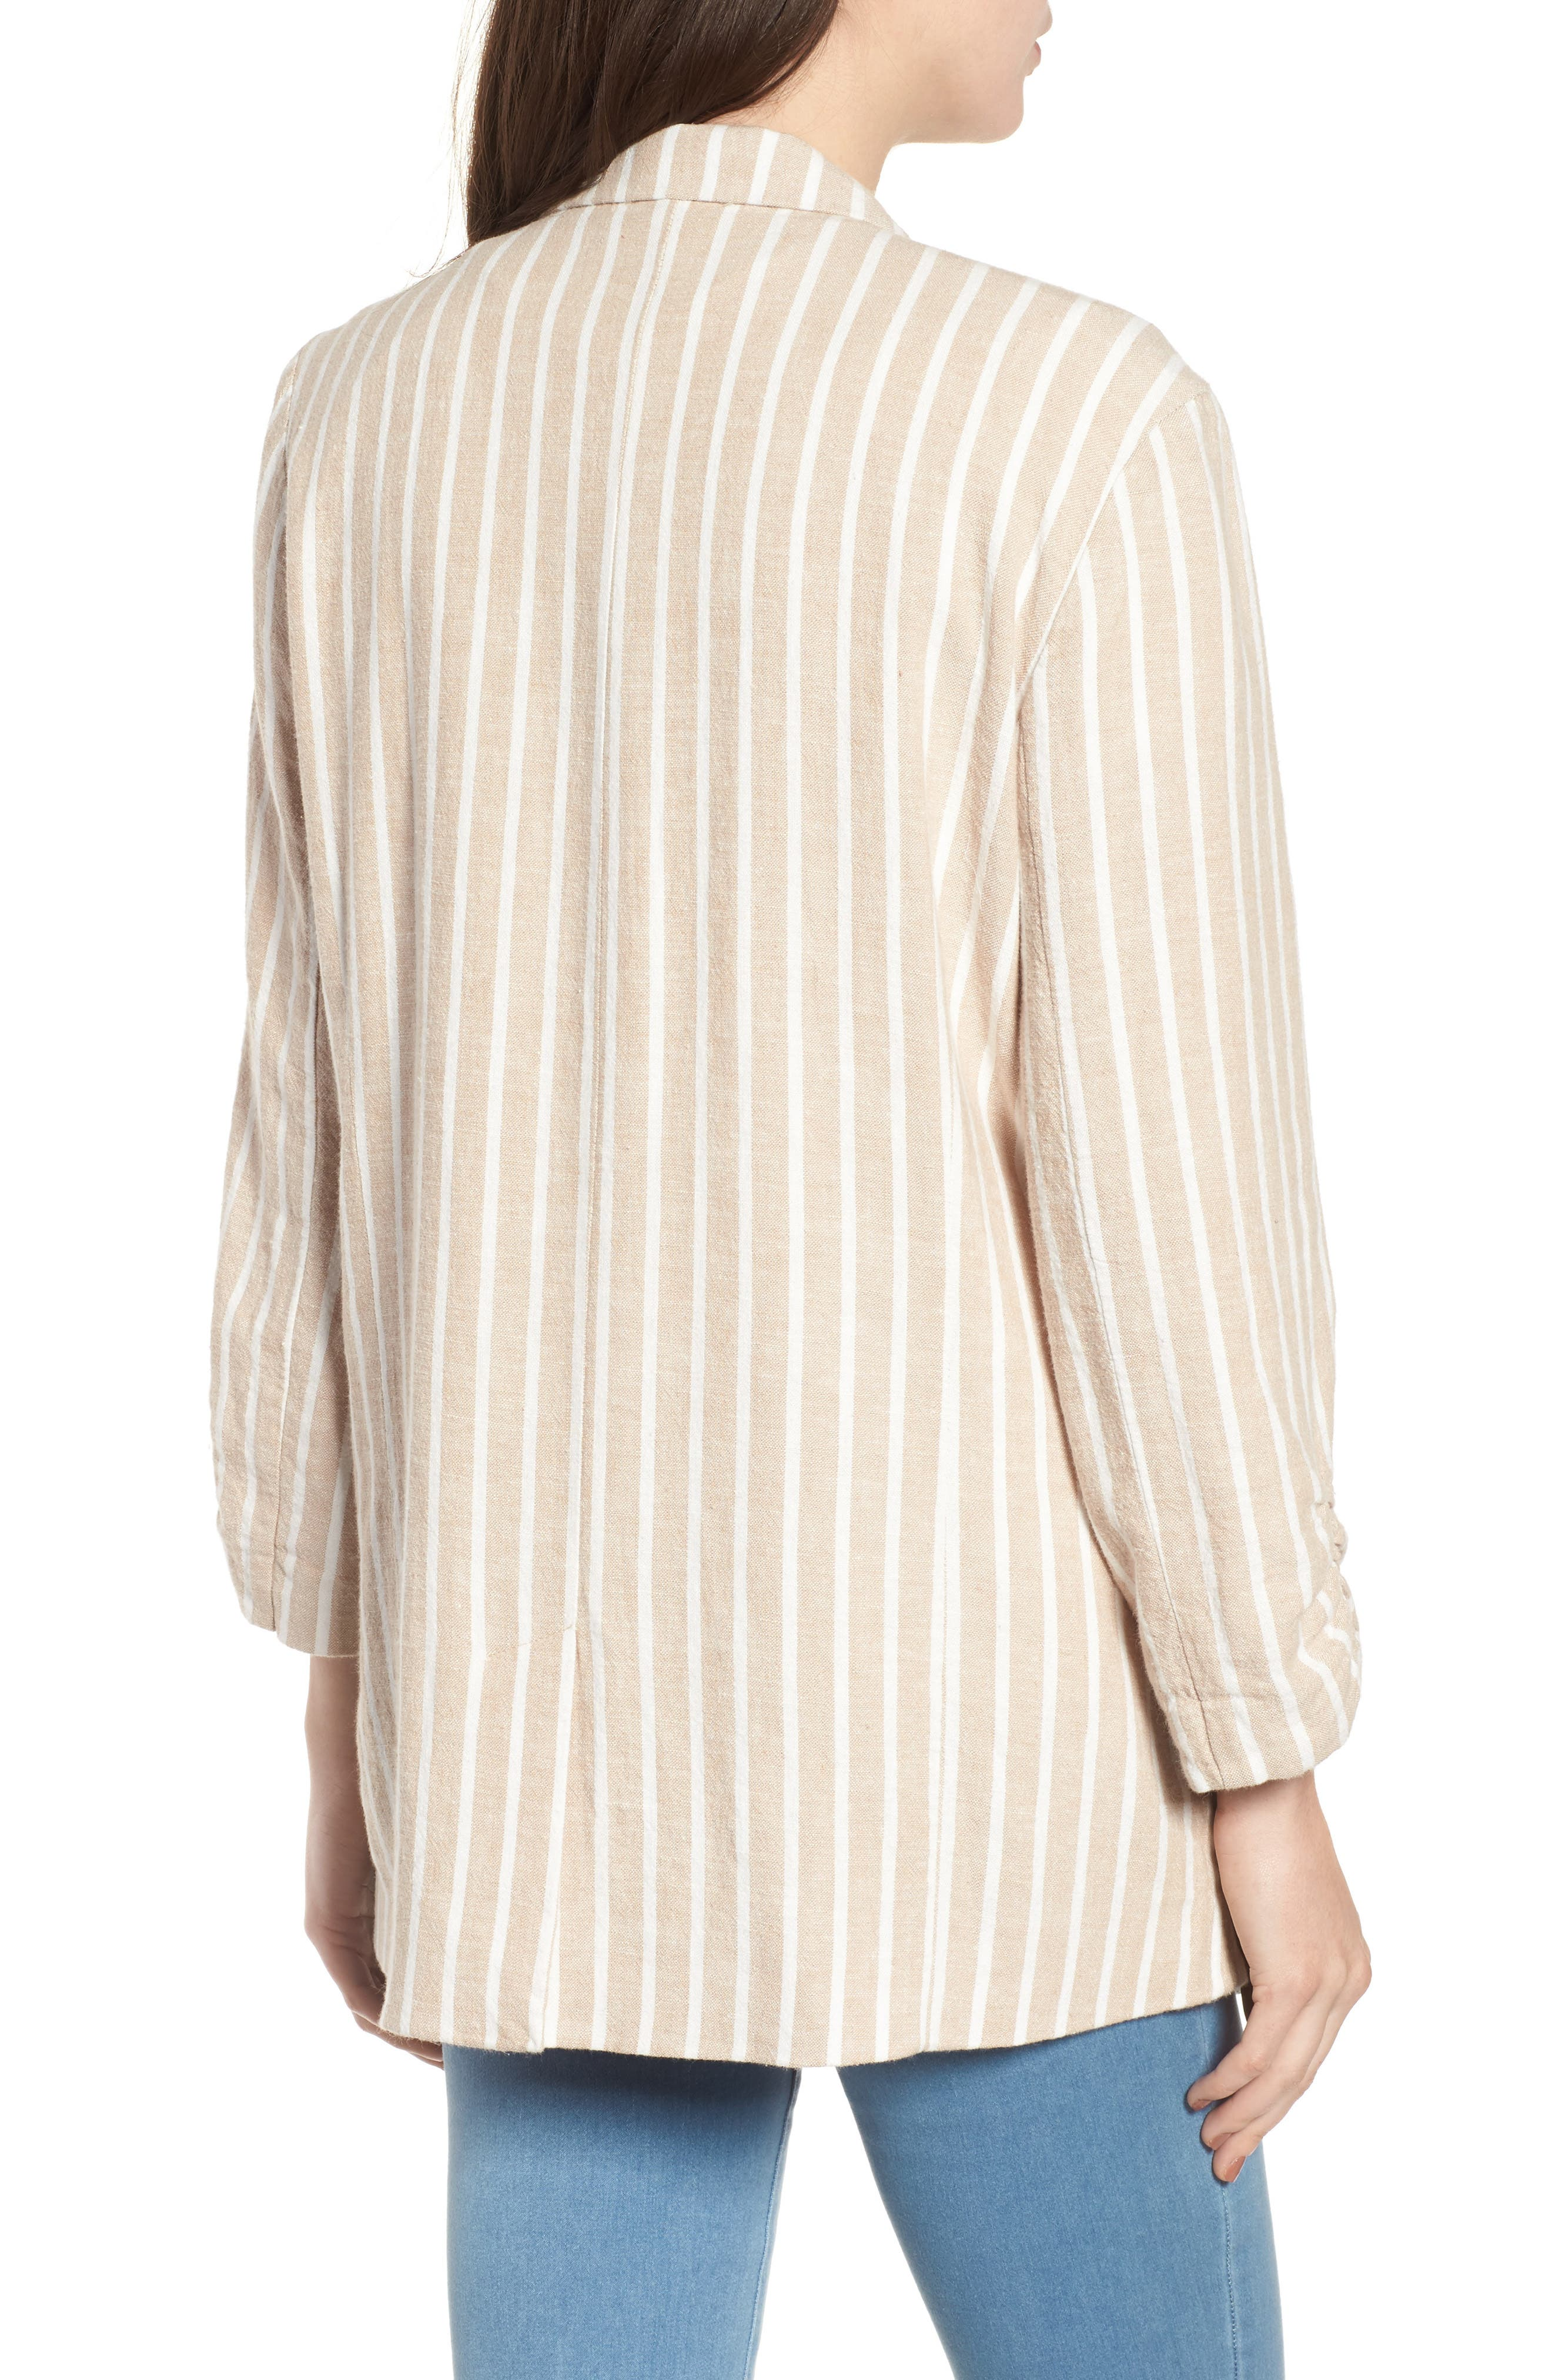 Cinch Sleeve Blazer,                             Alternate thumbnail 2, color,                             Tan Nomad Ella Linen Stripe